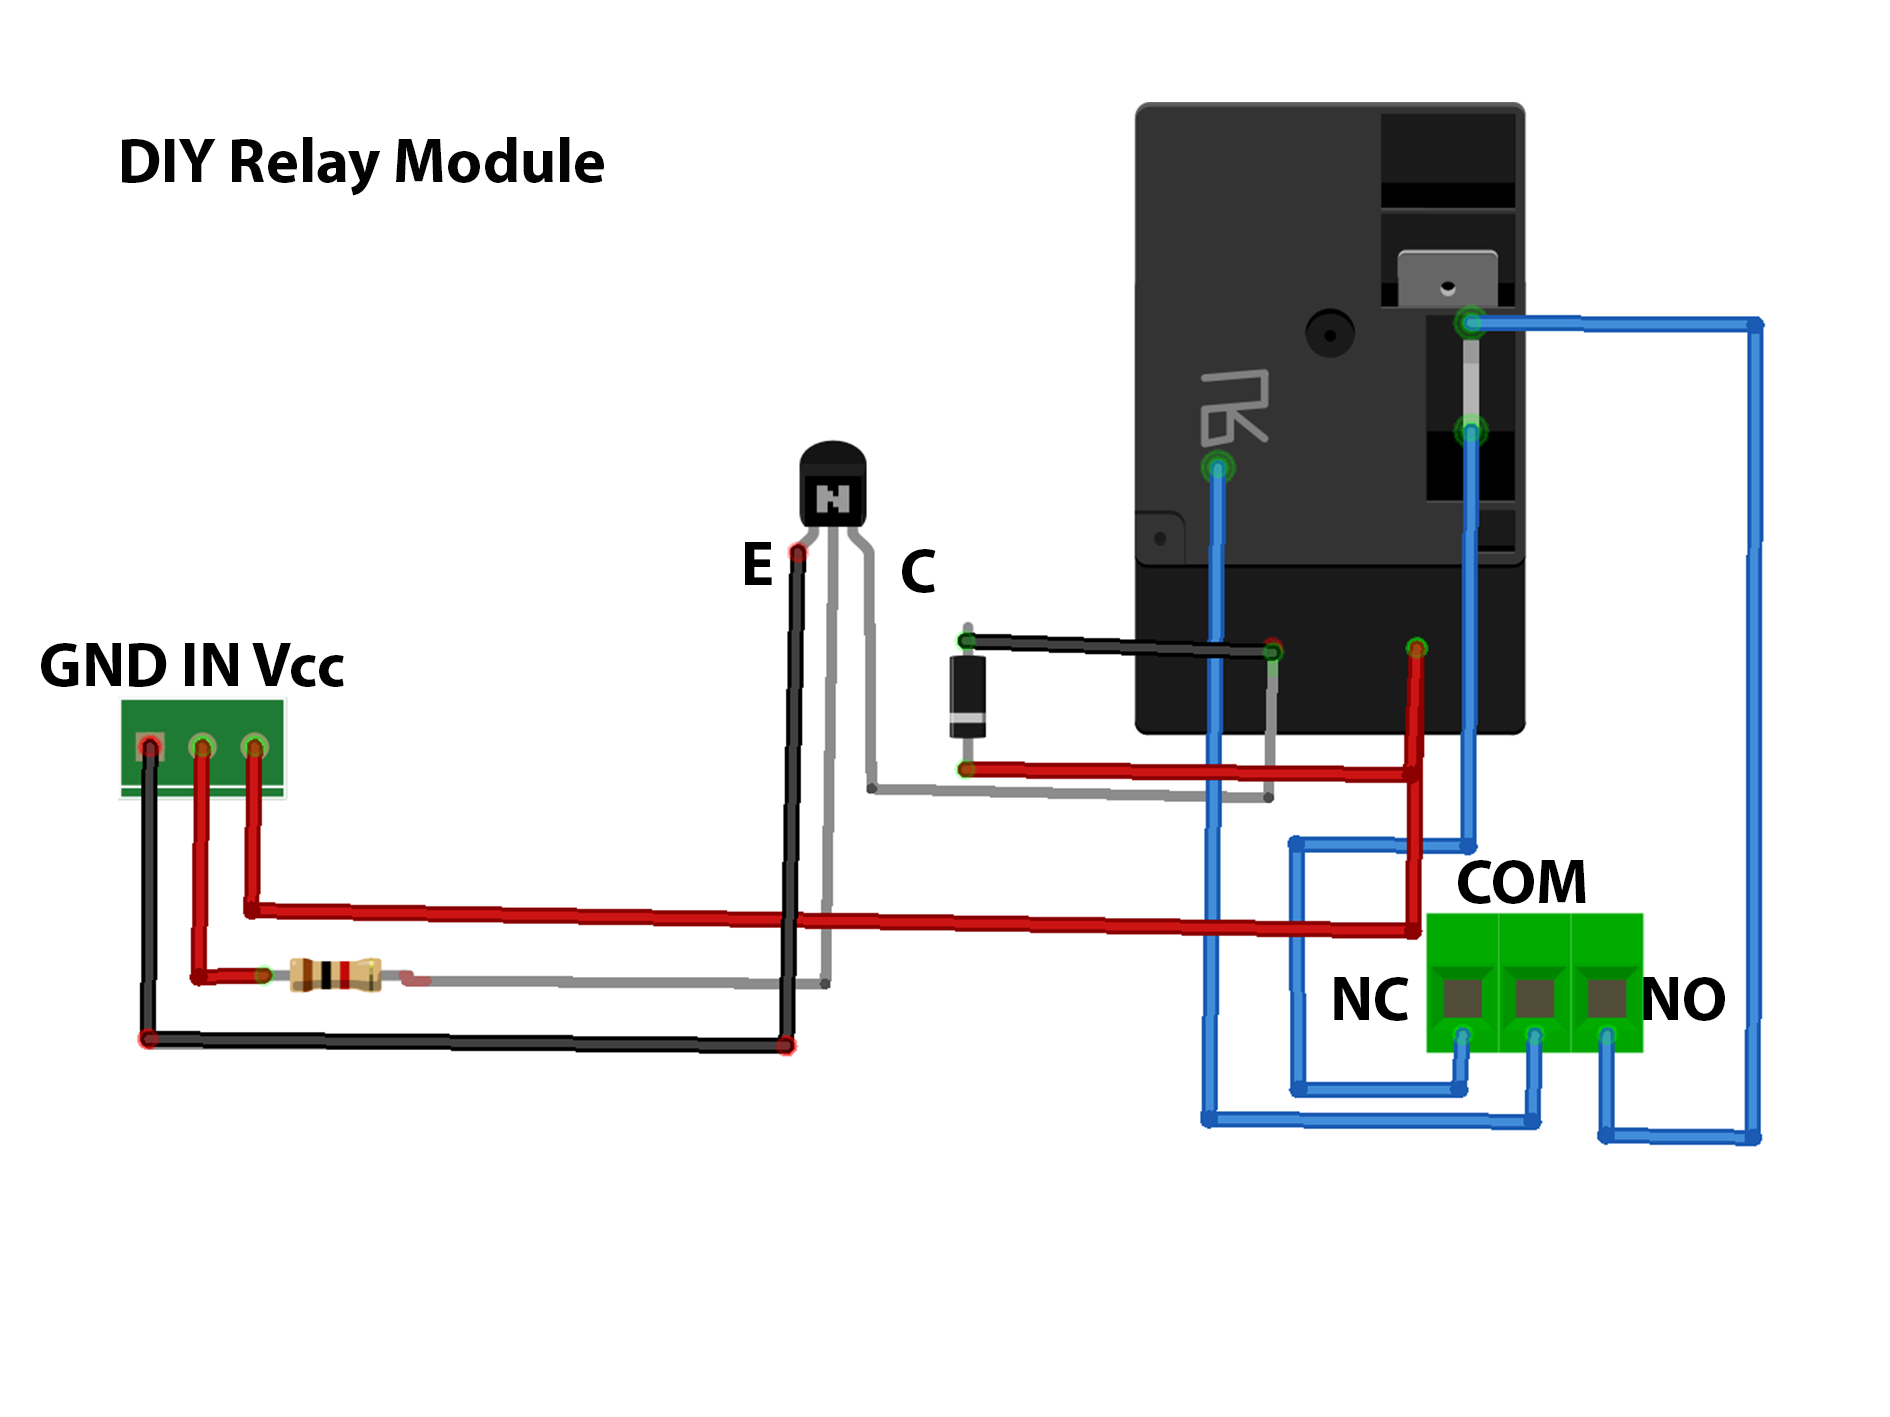 Relay module flgzqjdffp